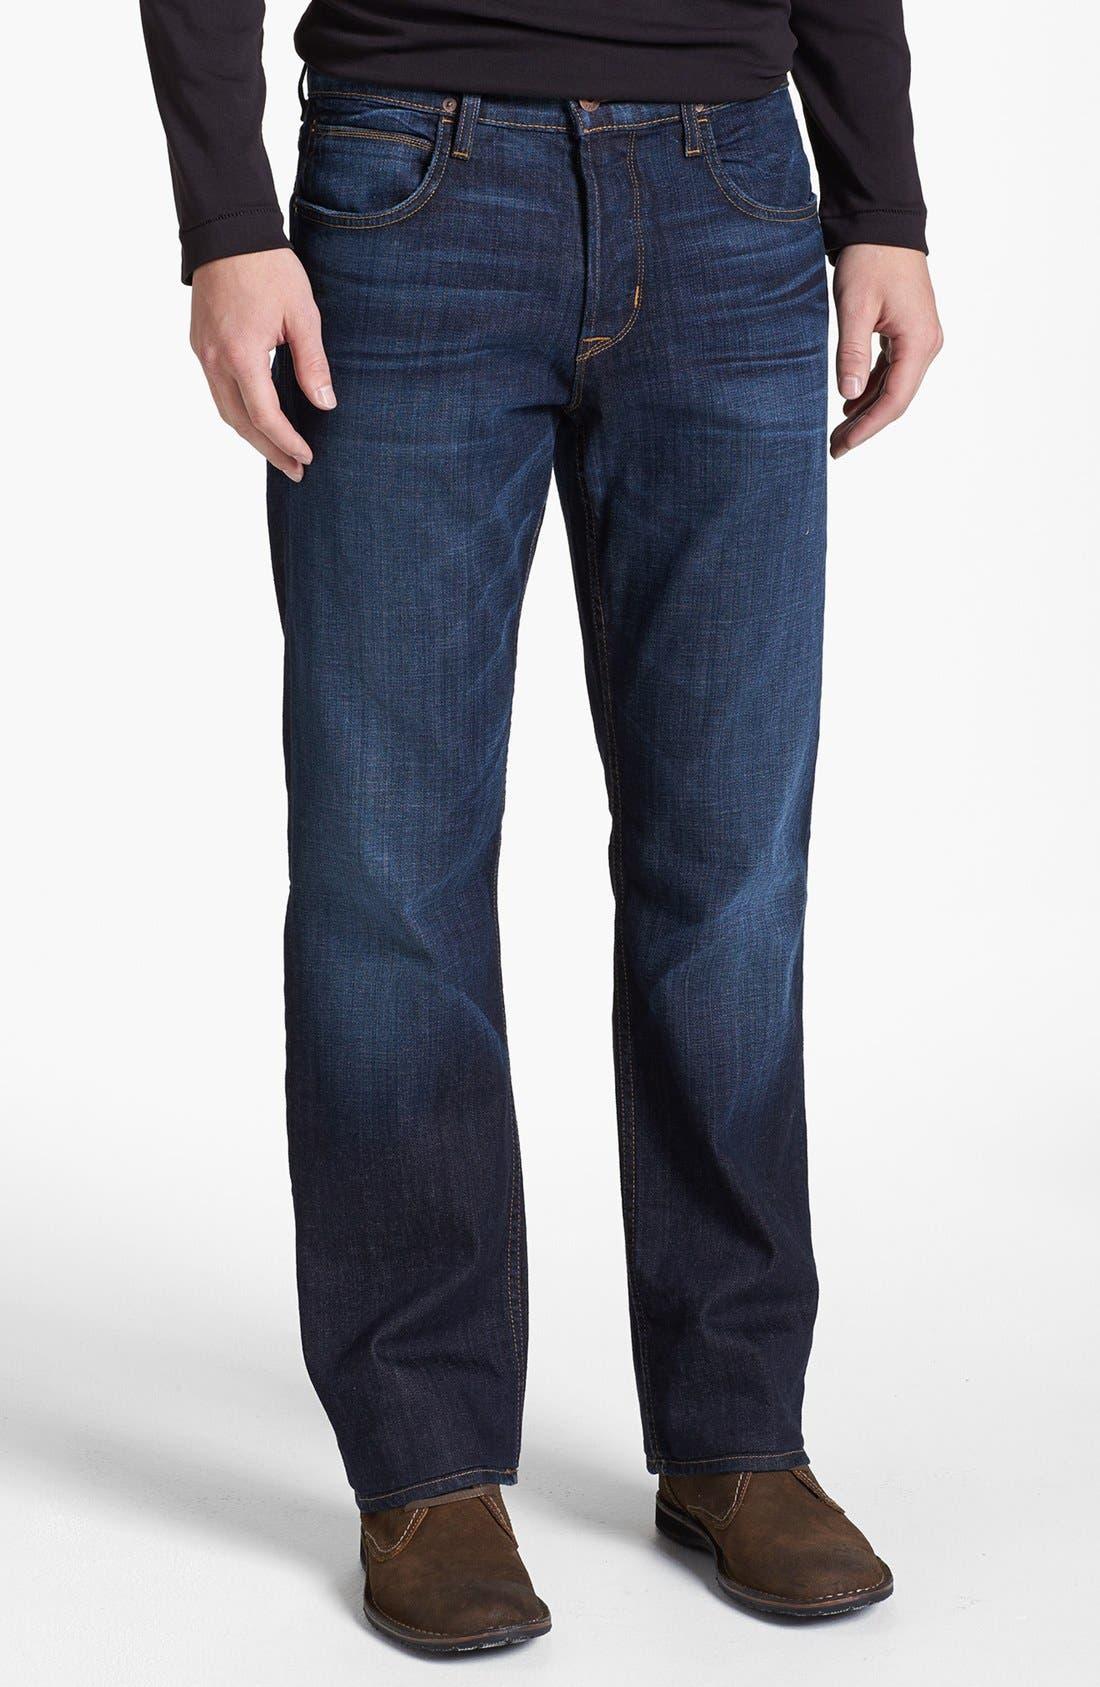 Alternate Image 1 Selected - Hudson Jeans Straight Leg Jeans (Latour) (Tall)